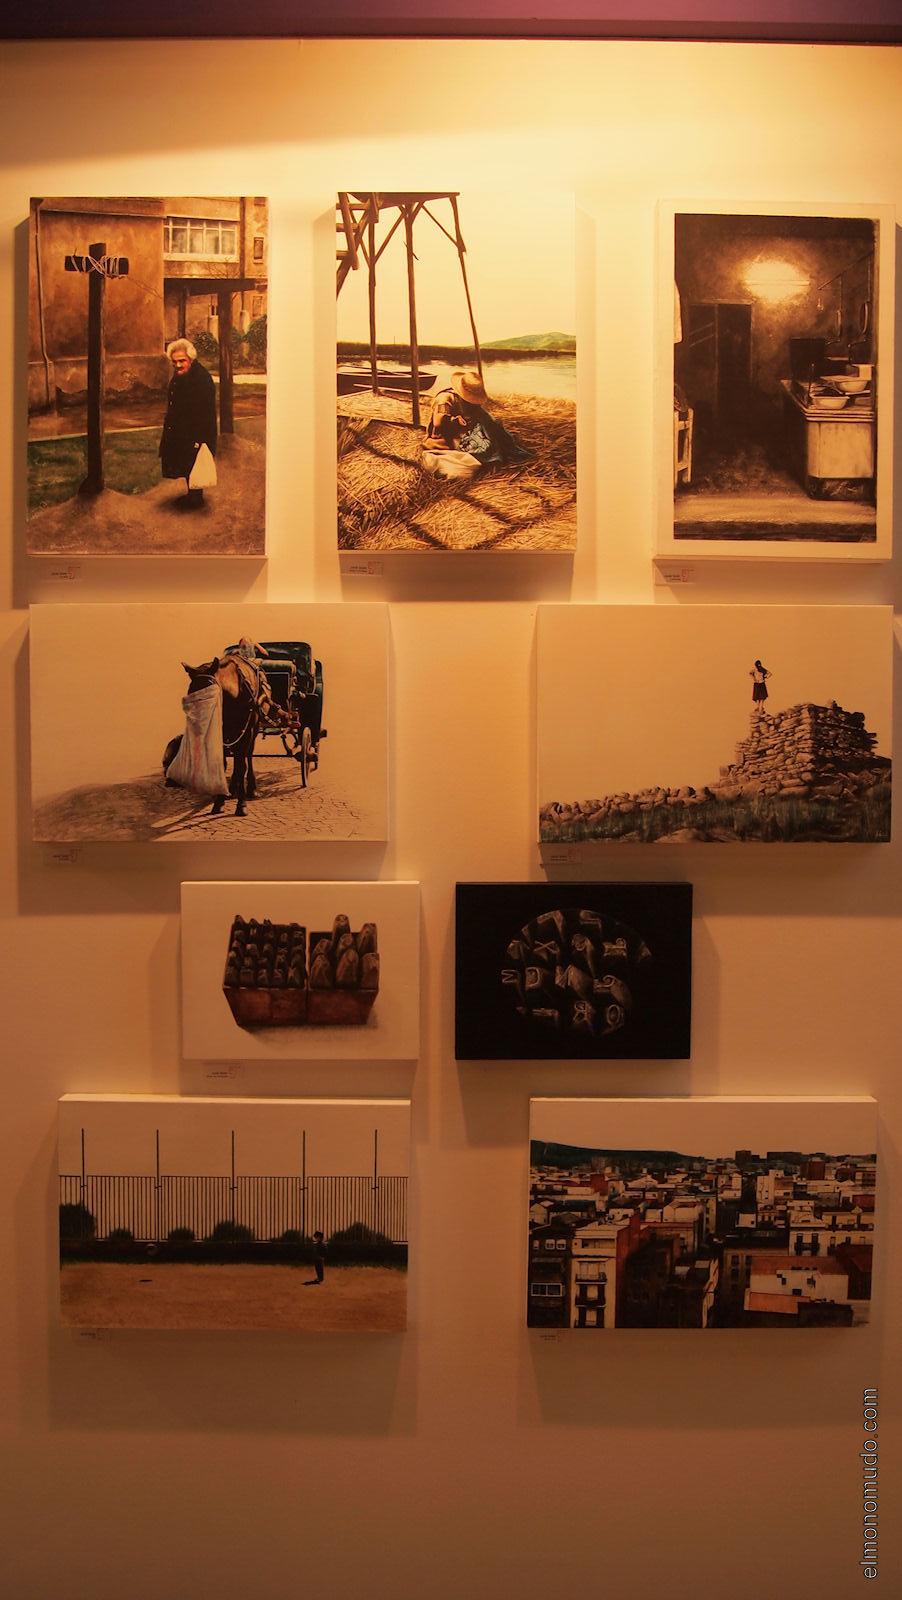 exposicion-illa-barcelona-2012-toma13